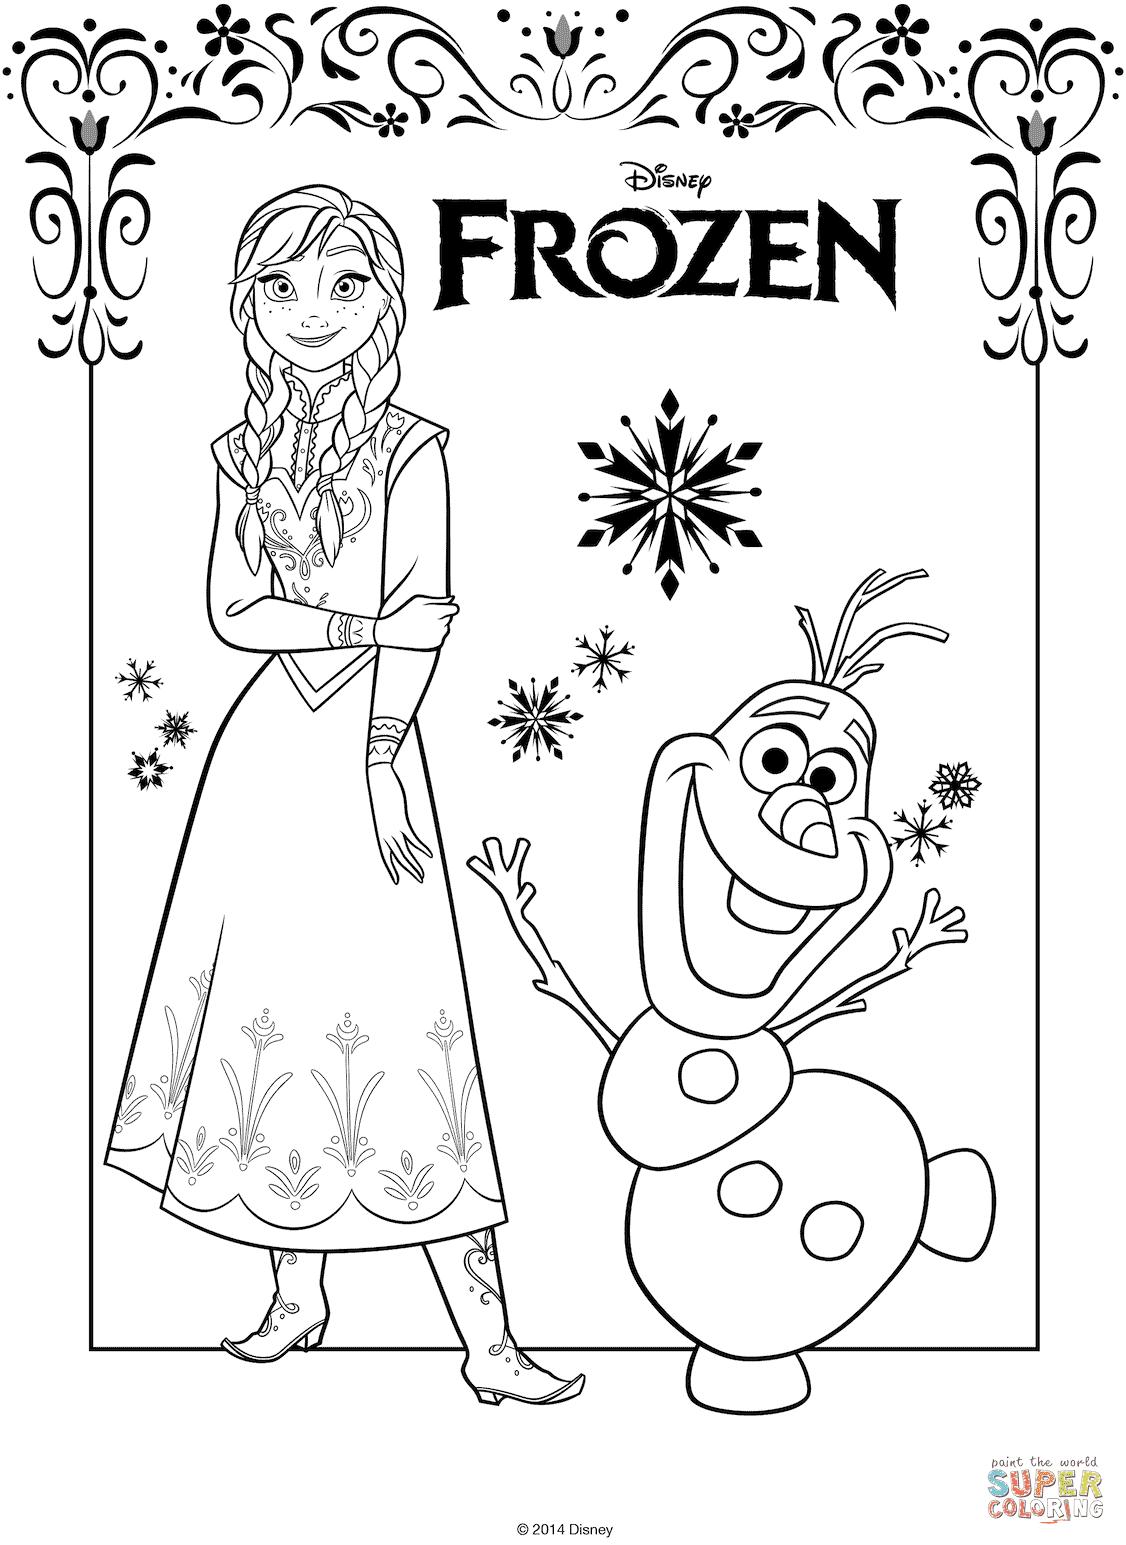 10 Mewarnai Gambar Frozen 5